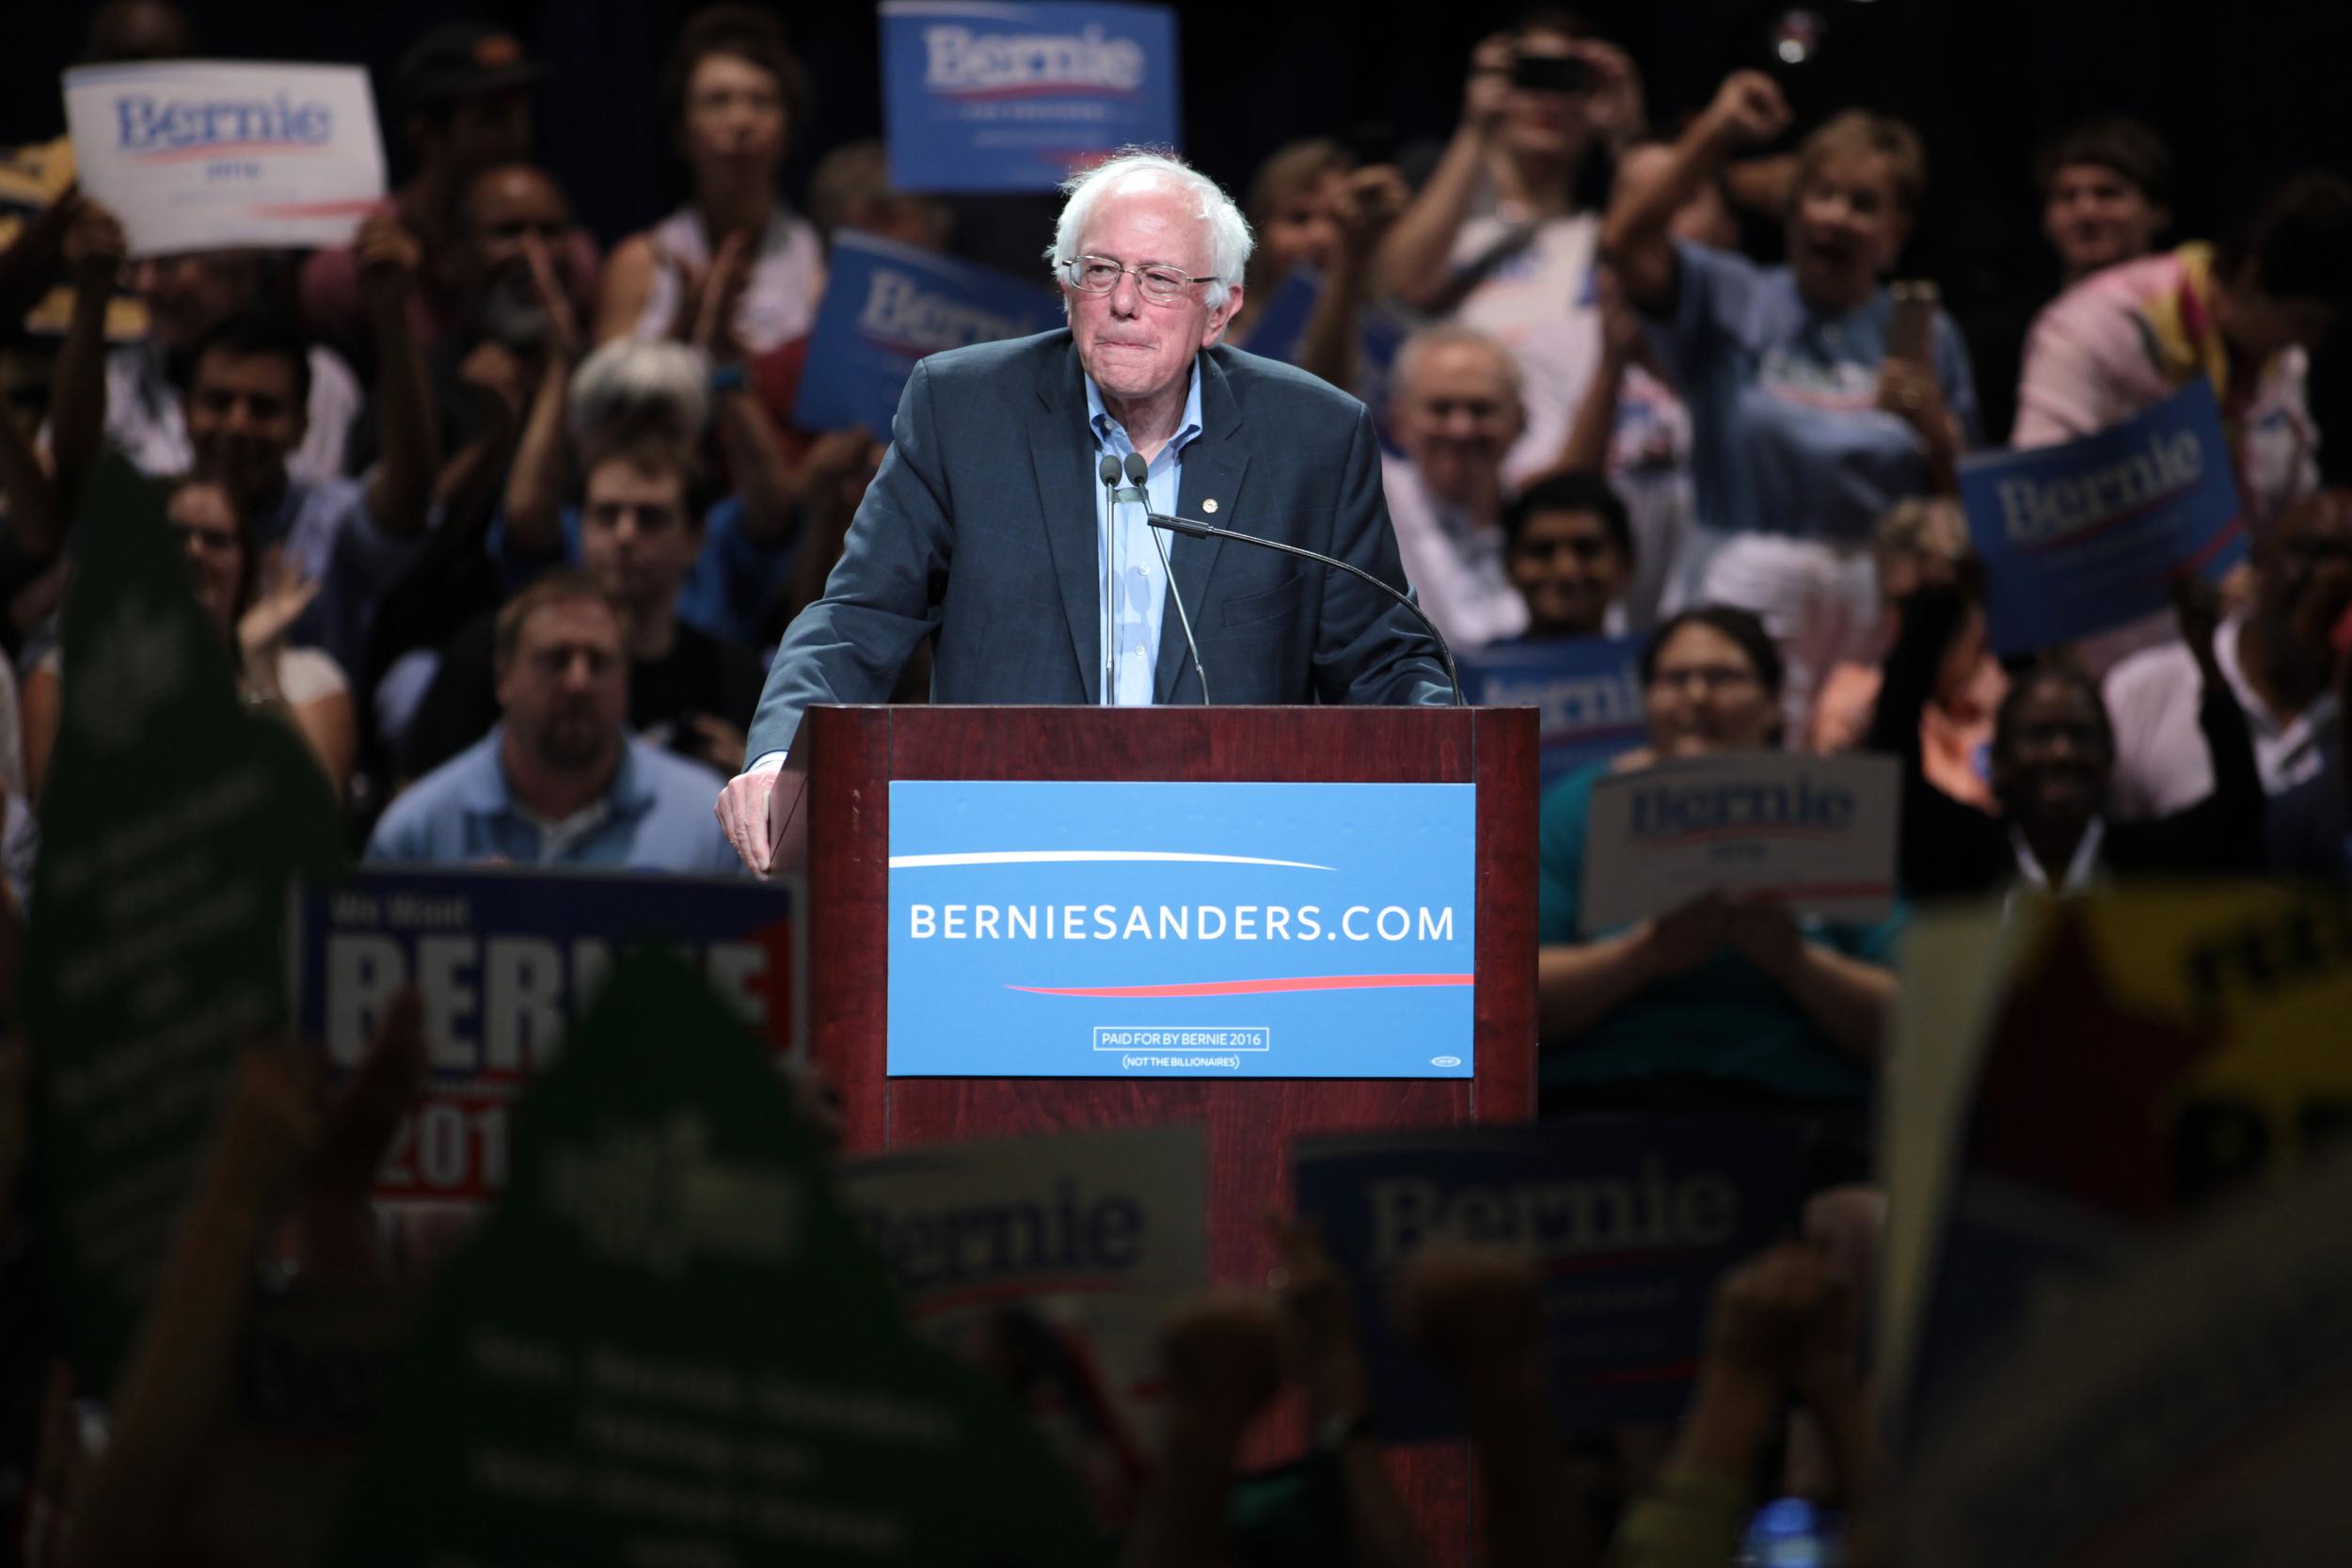 Sen. Bernie Sanders speaking at a town meeting at the Phoenix Convention Center in Phoenix, Arizona.  Flickr / Gage Skidmore .